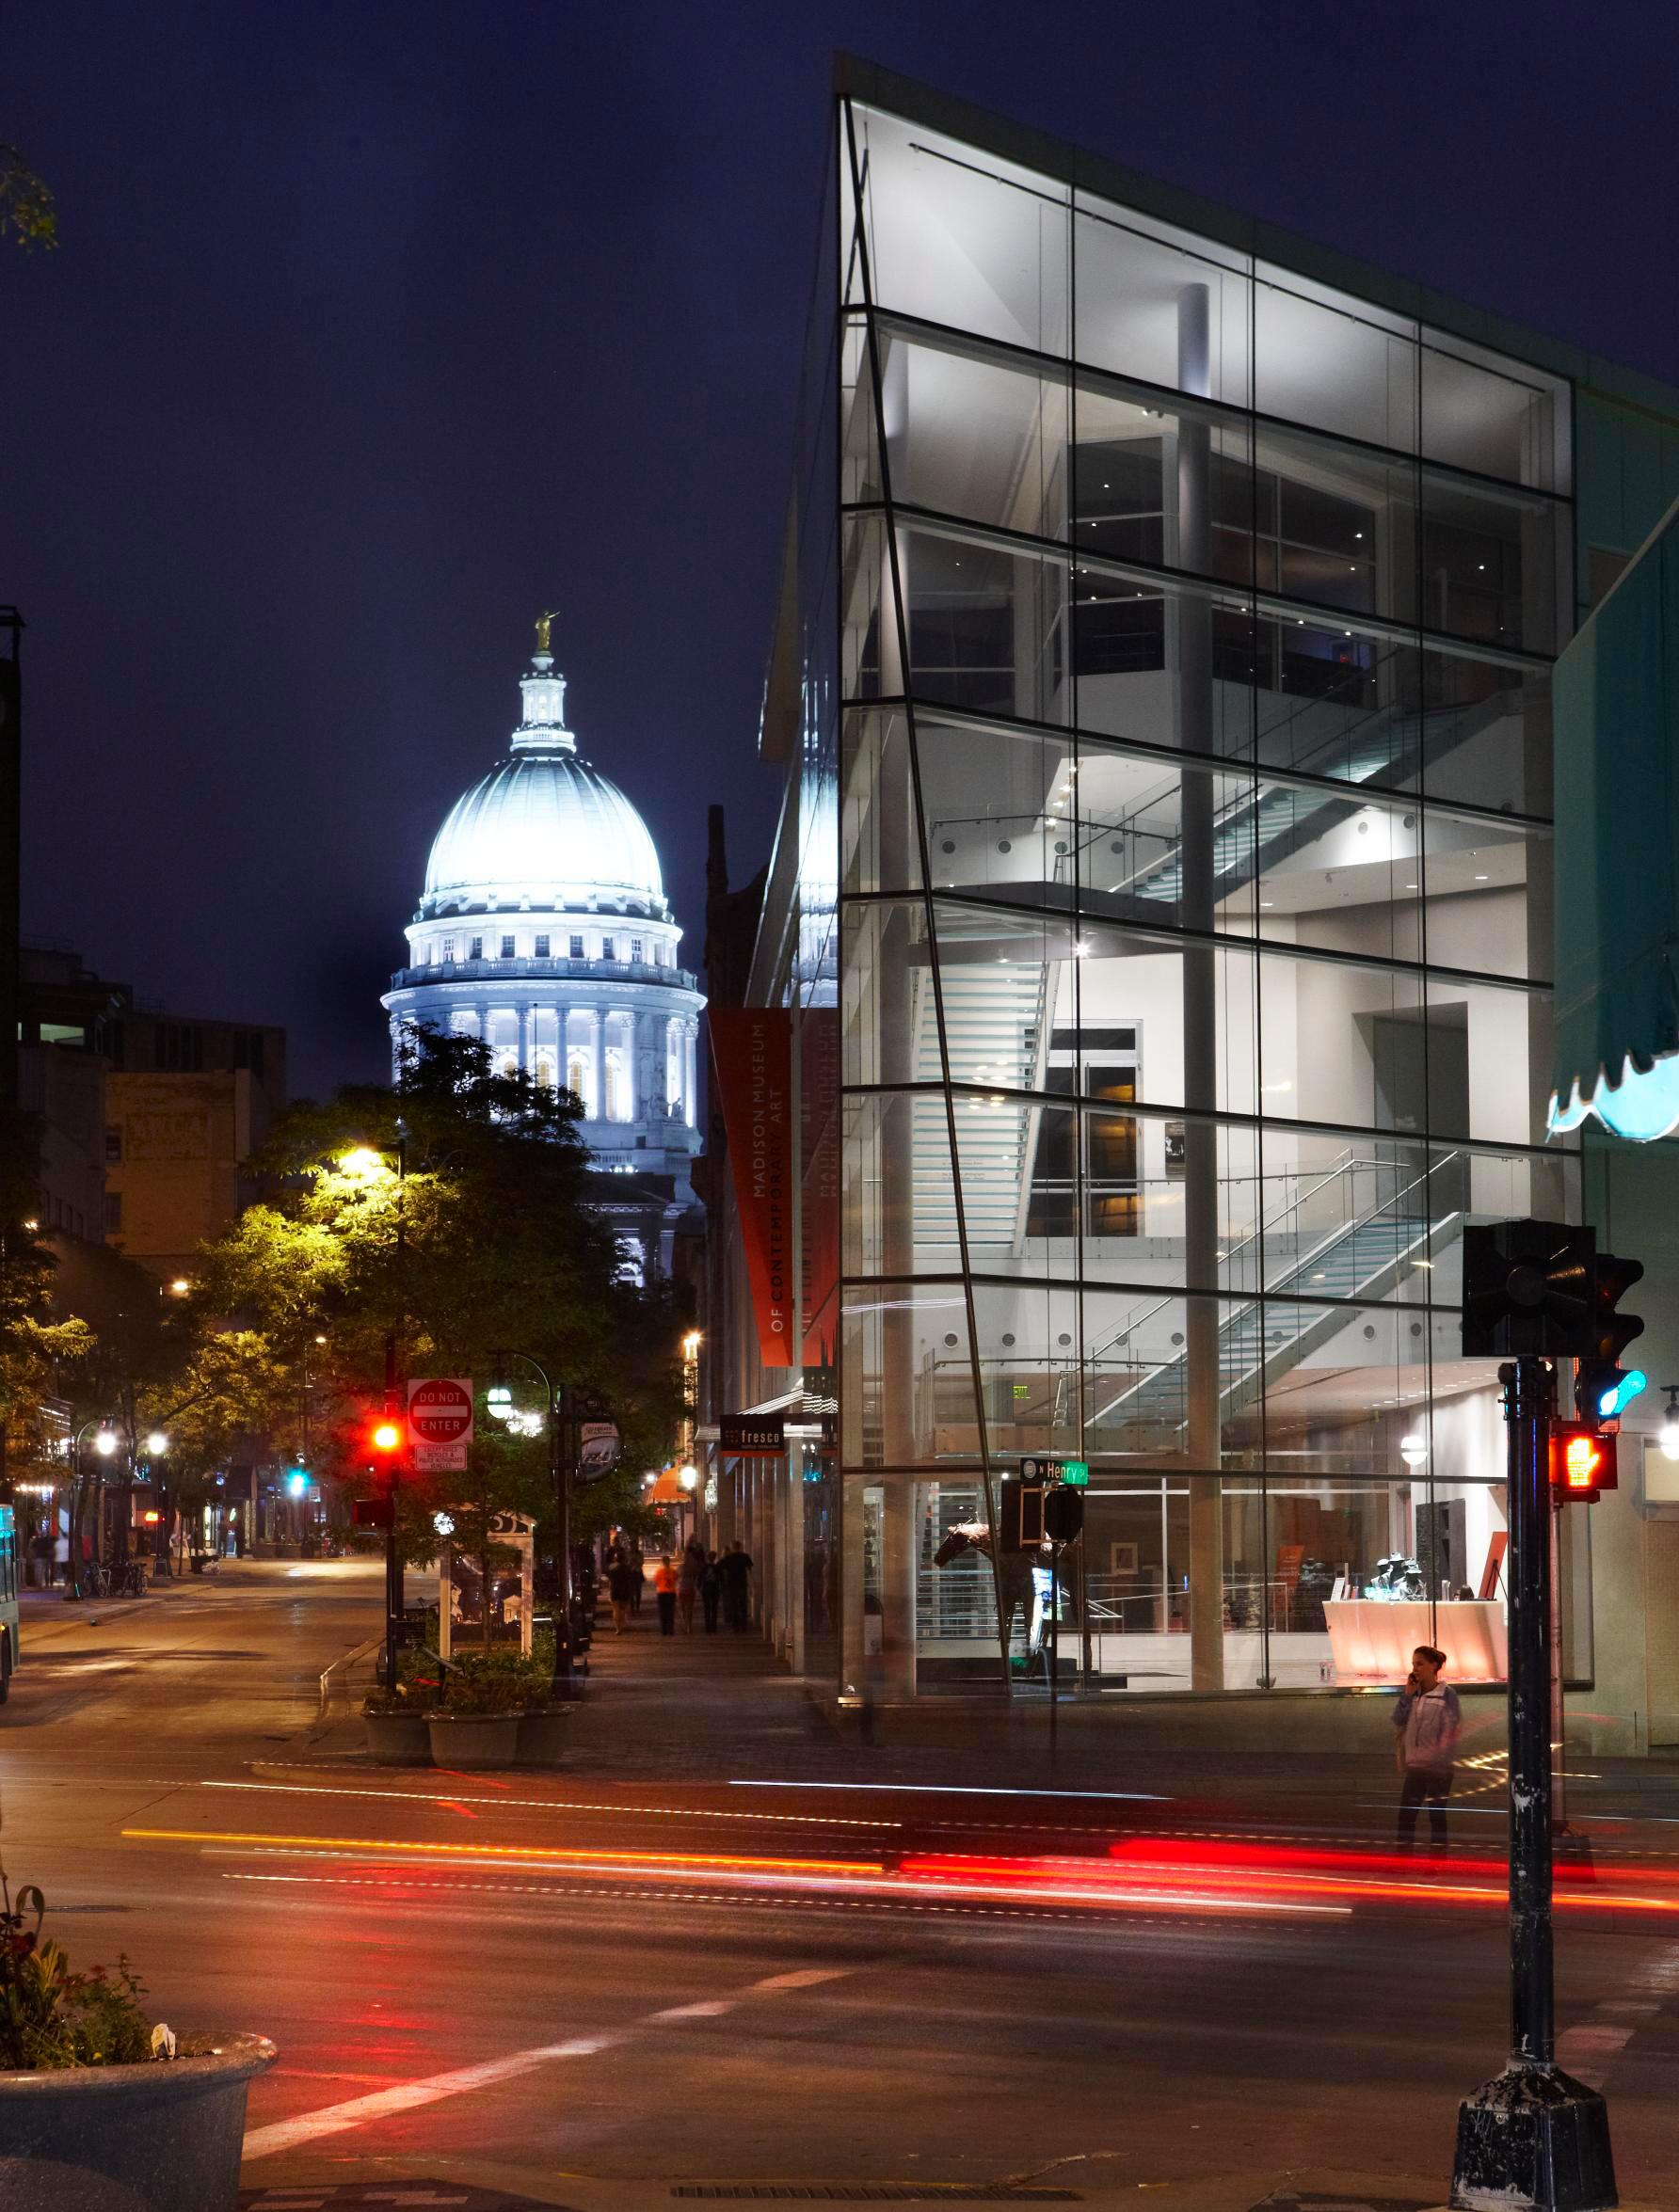 Madison, Wisconsin: 147 miles northwest of Chicago